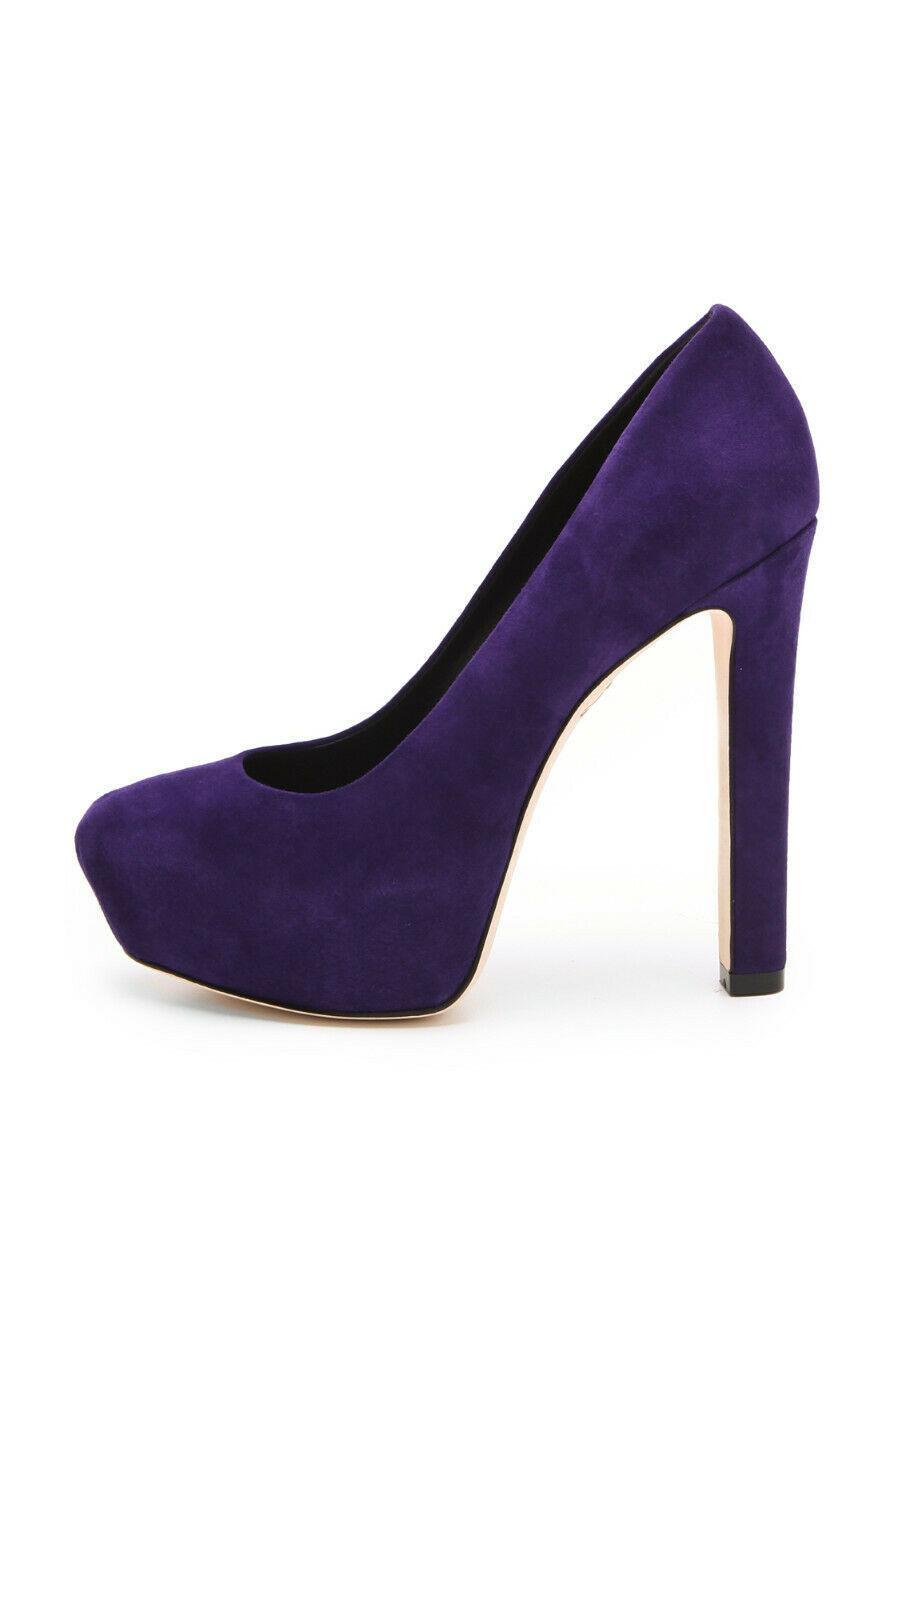 Brian Atwood Savita Platform Pumps Suede Purple, Size 8 M image 2